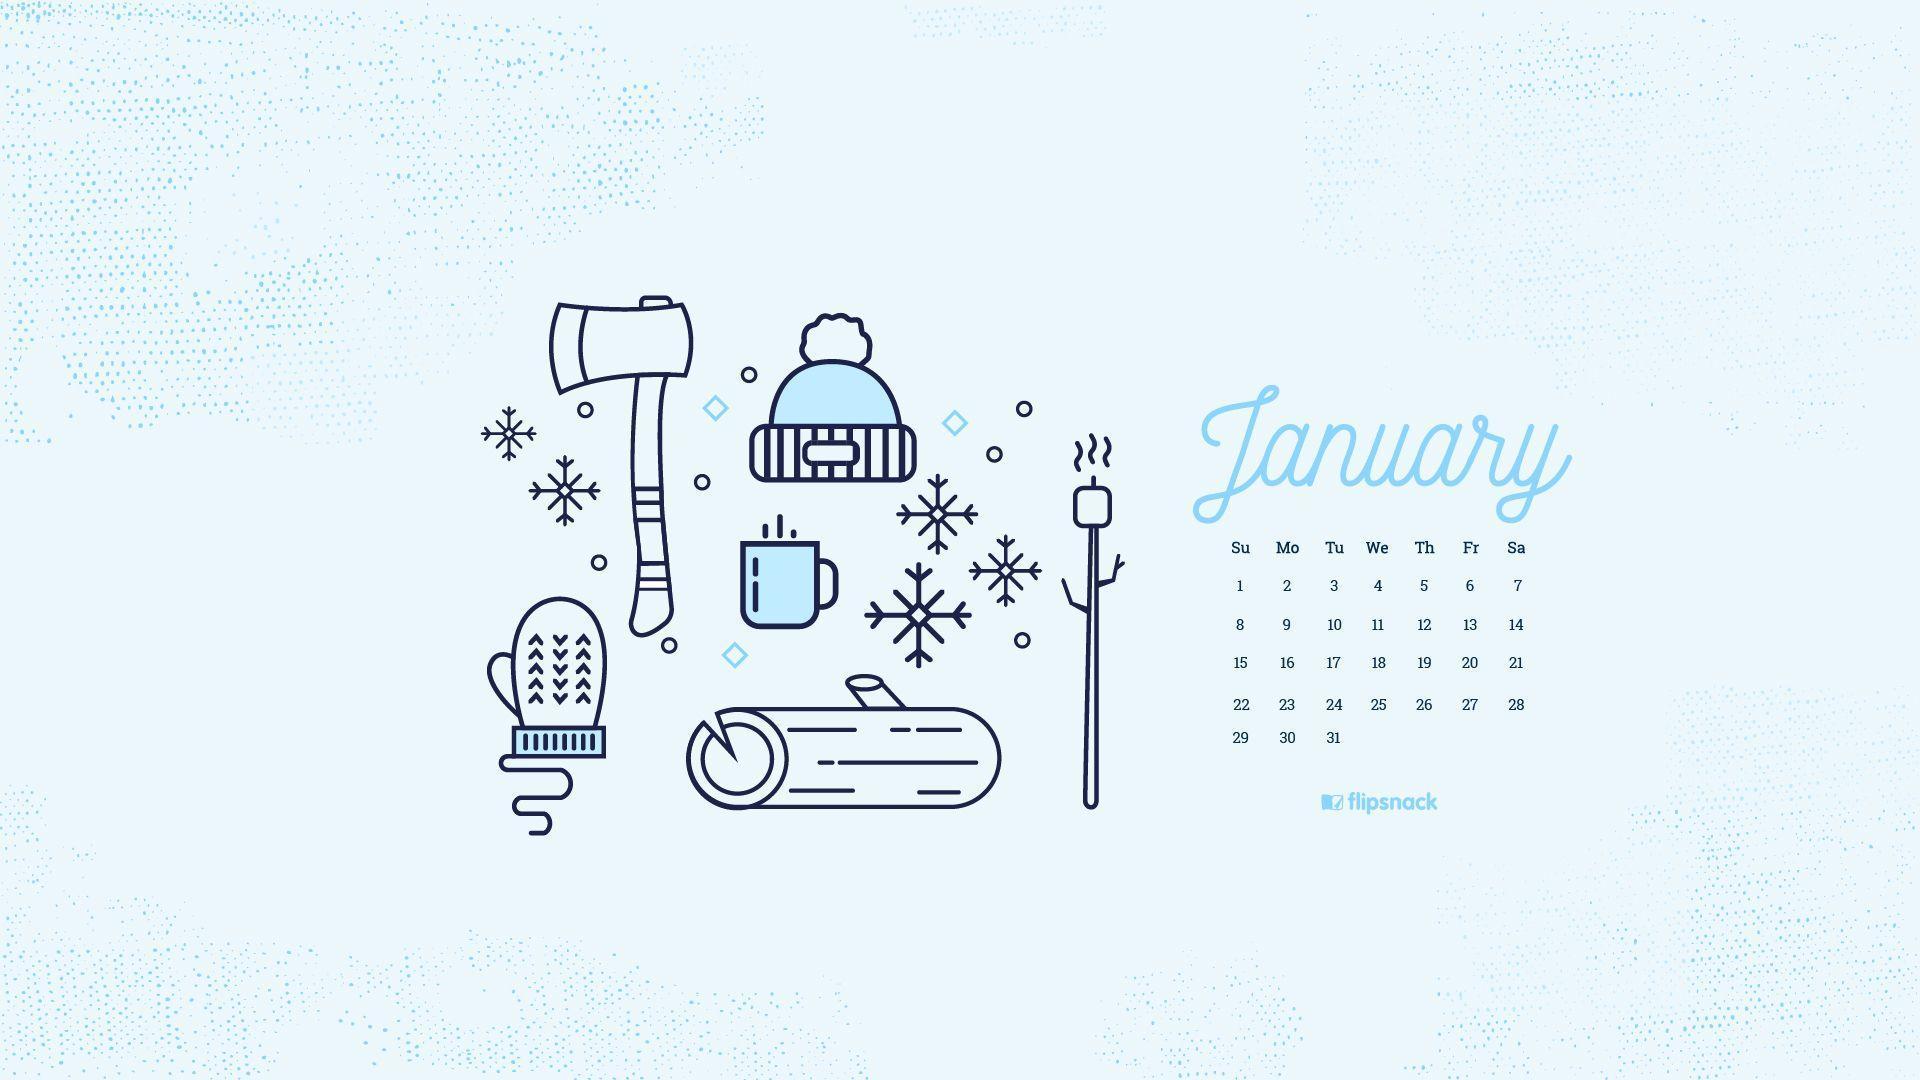 Calendar Wallpaper January 2017 : Calendar wallpapers wallpaper cave